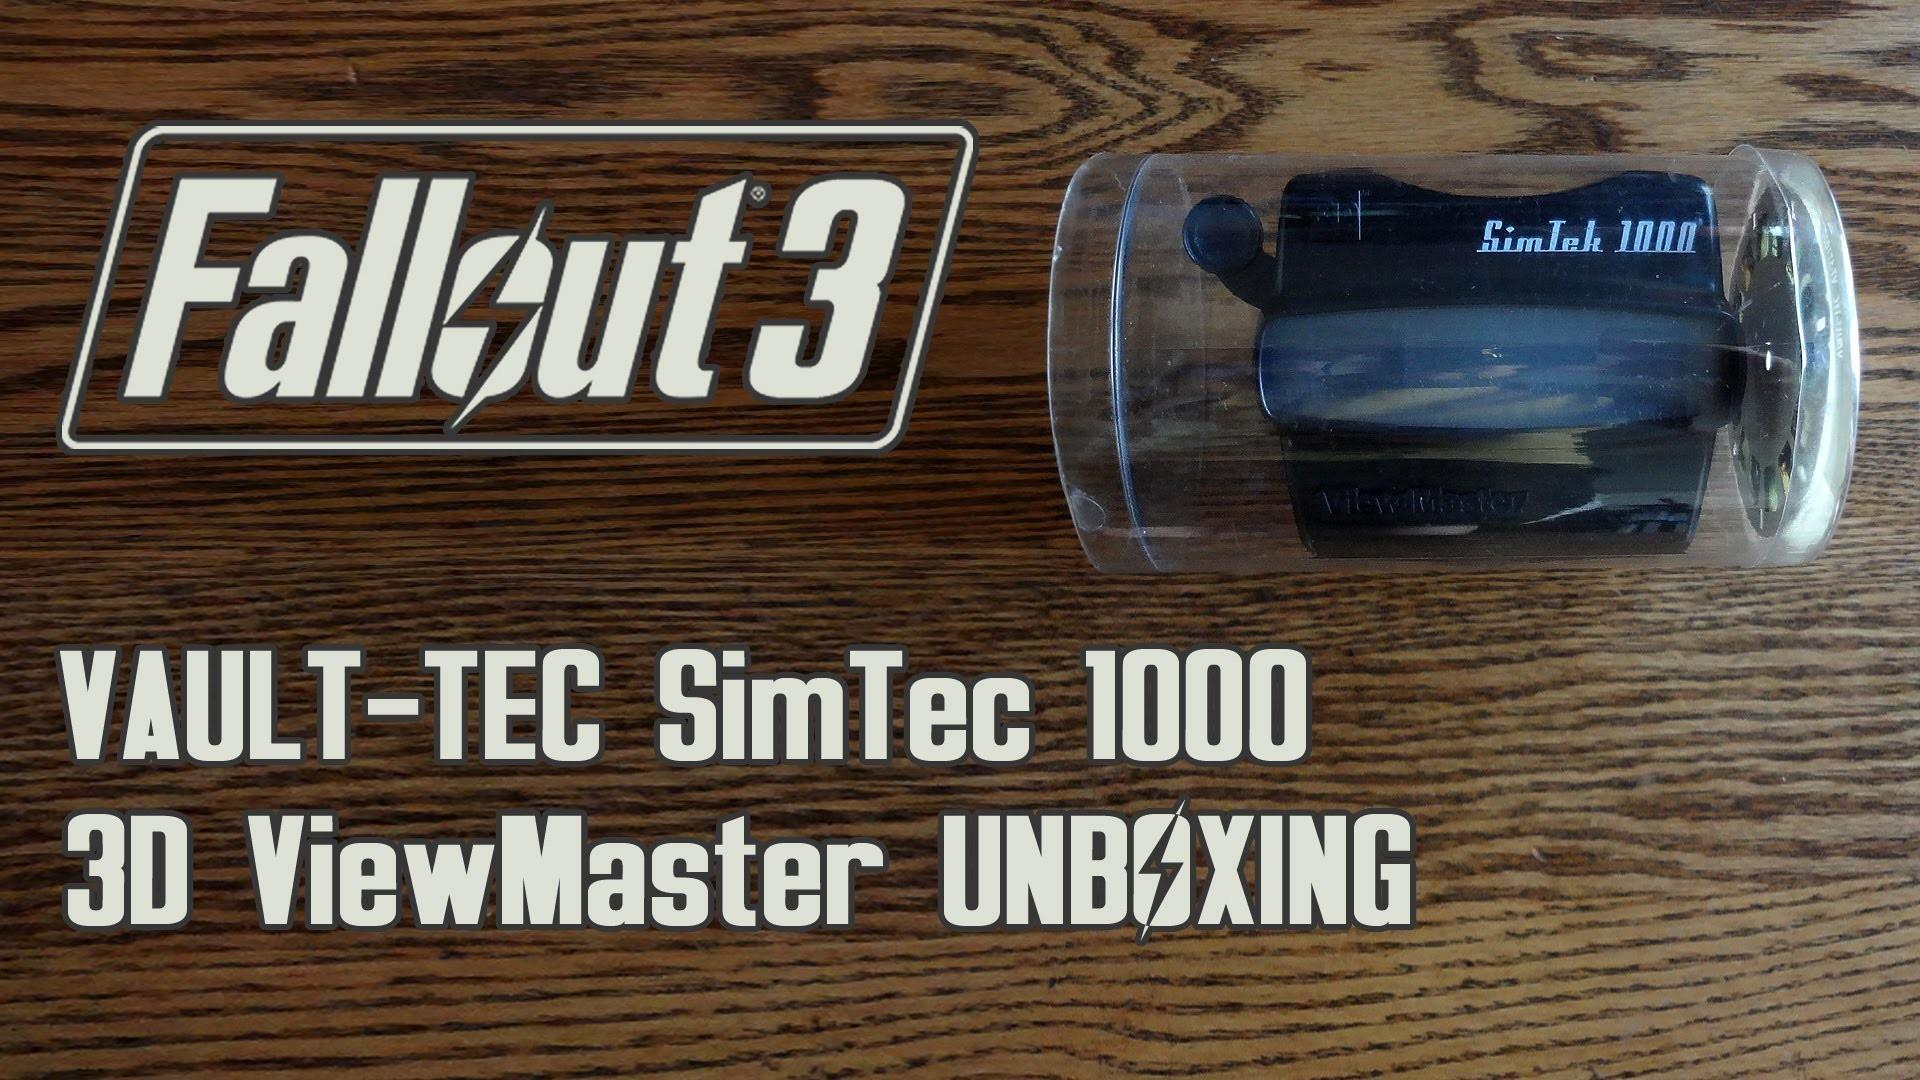 Fallout 3 VAULT-TEC SimTek 1000 3D ViewMaster from E3 2008 Unboxing &  Review – HD 1080p